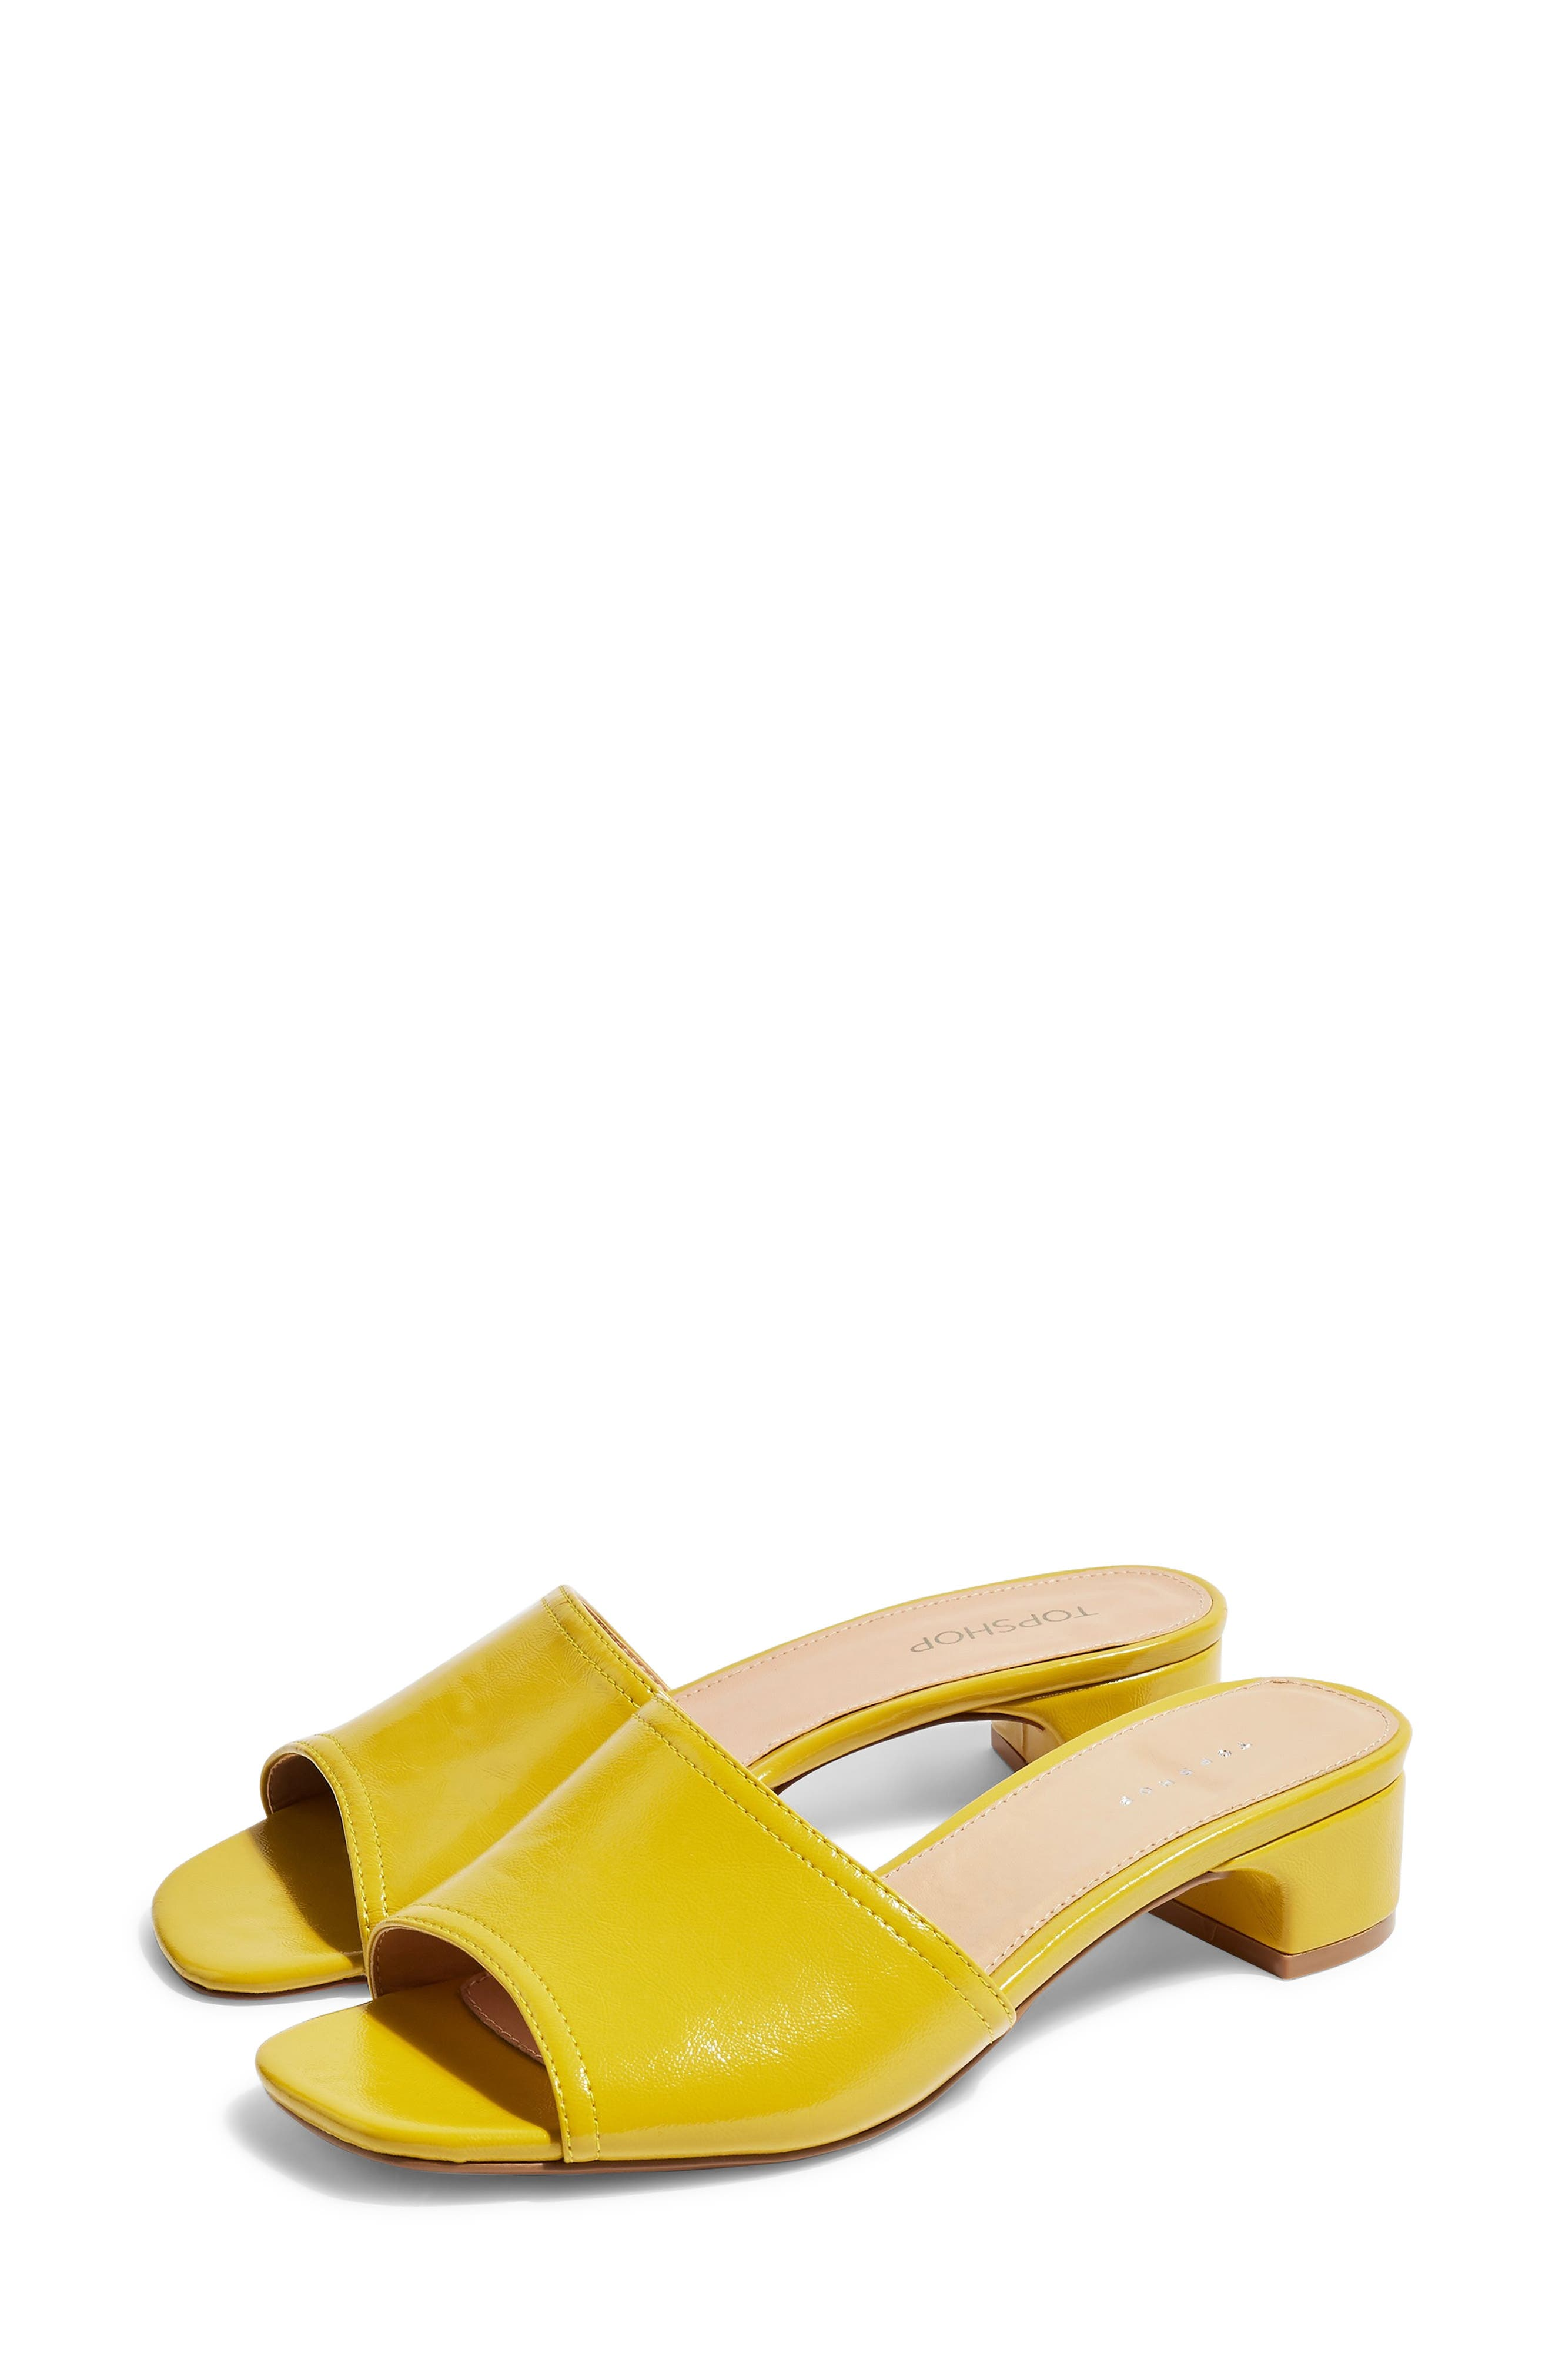 1eb75714a9a Topshop Diva Slide Sandal